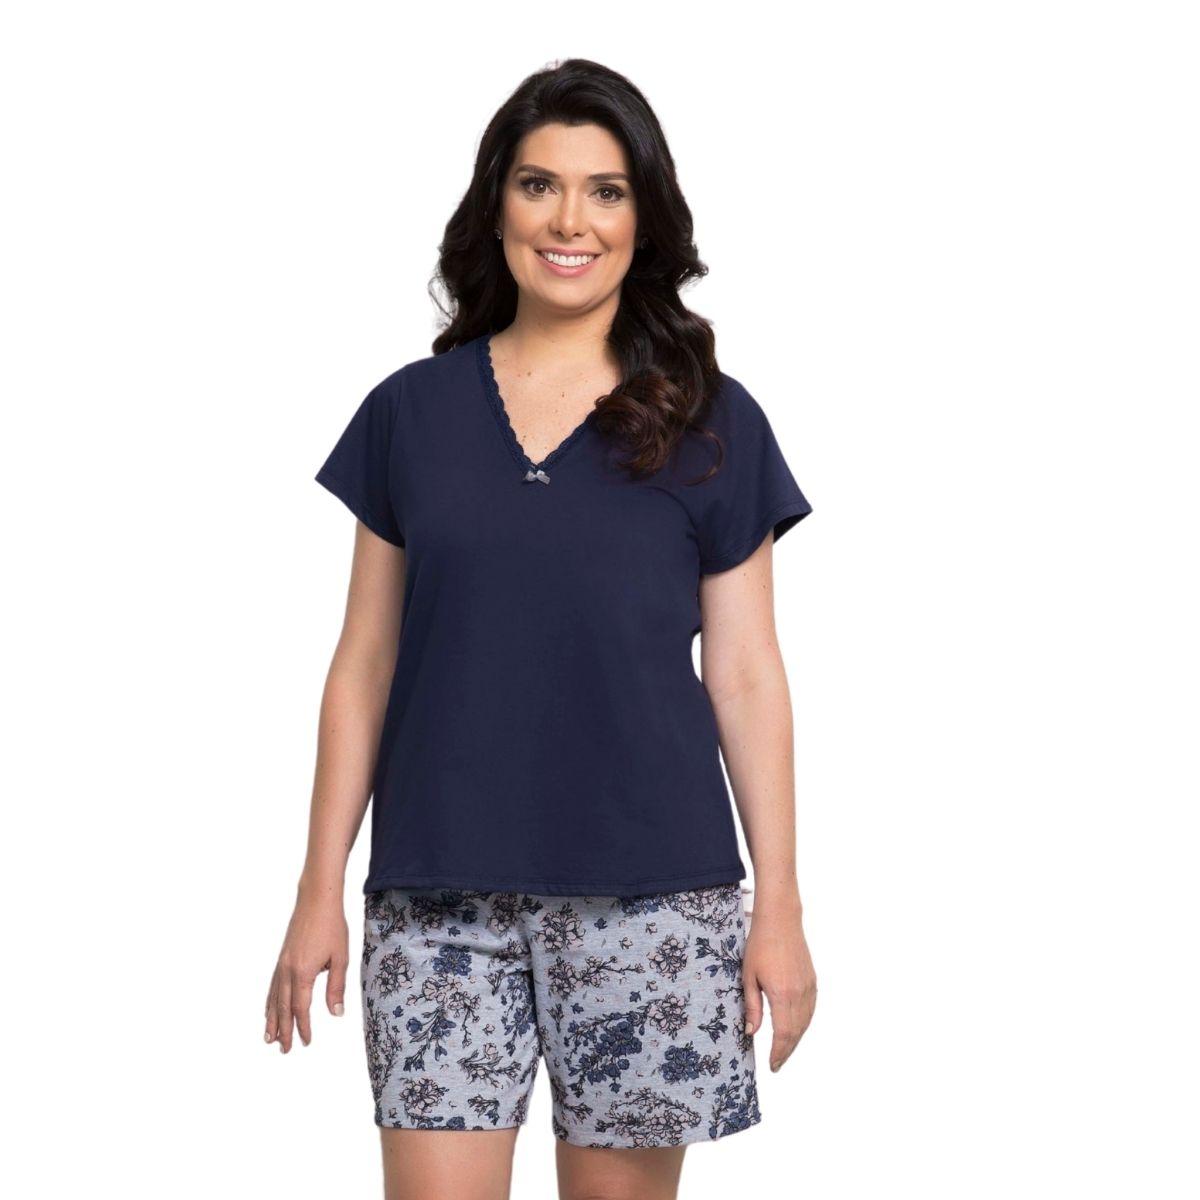 Bermudoll camiseta manga curta renda algodão